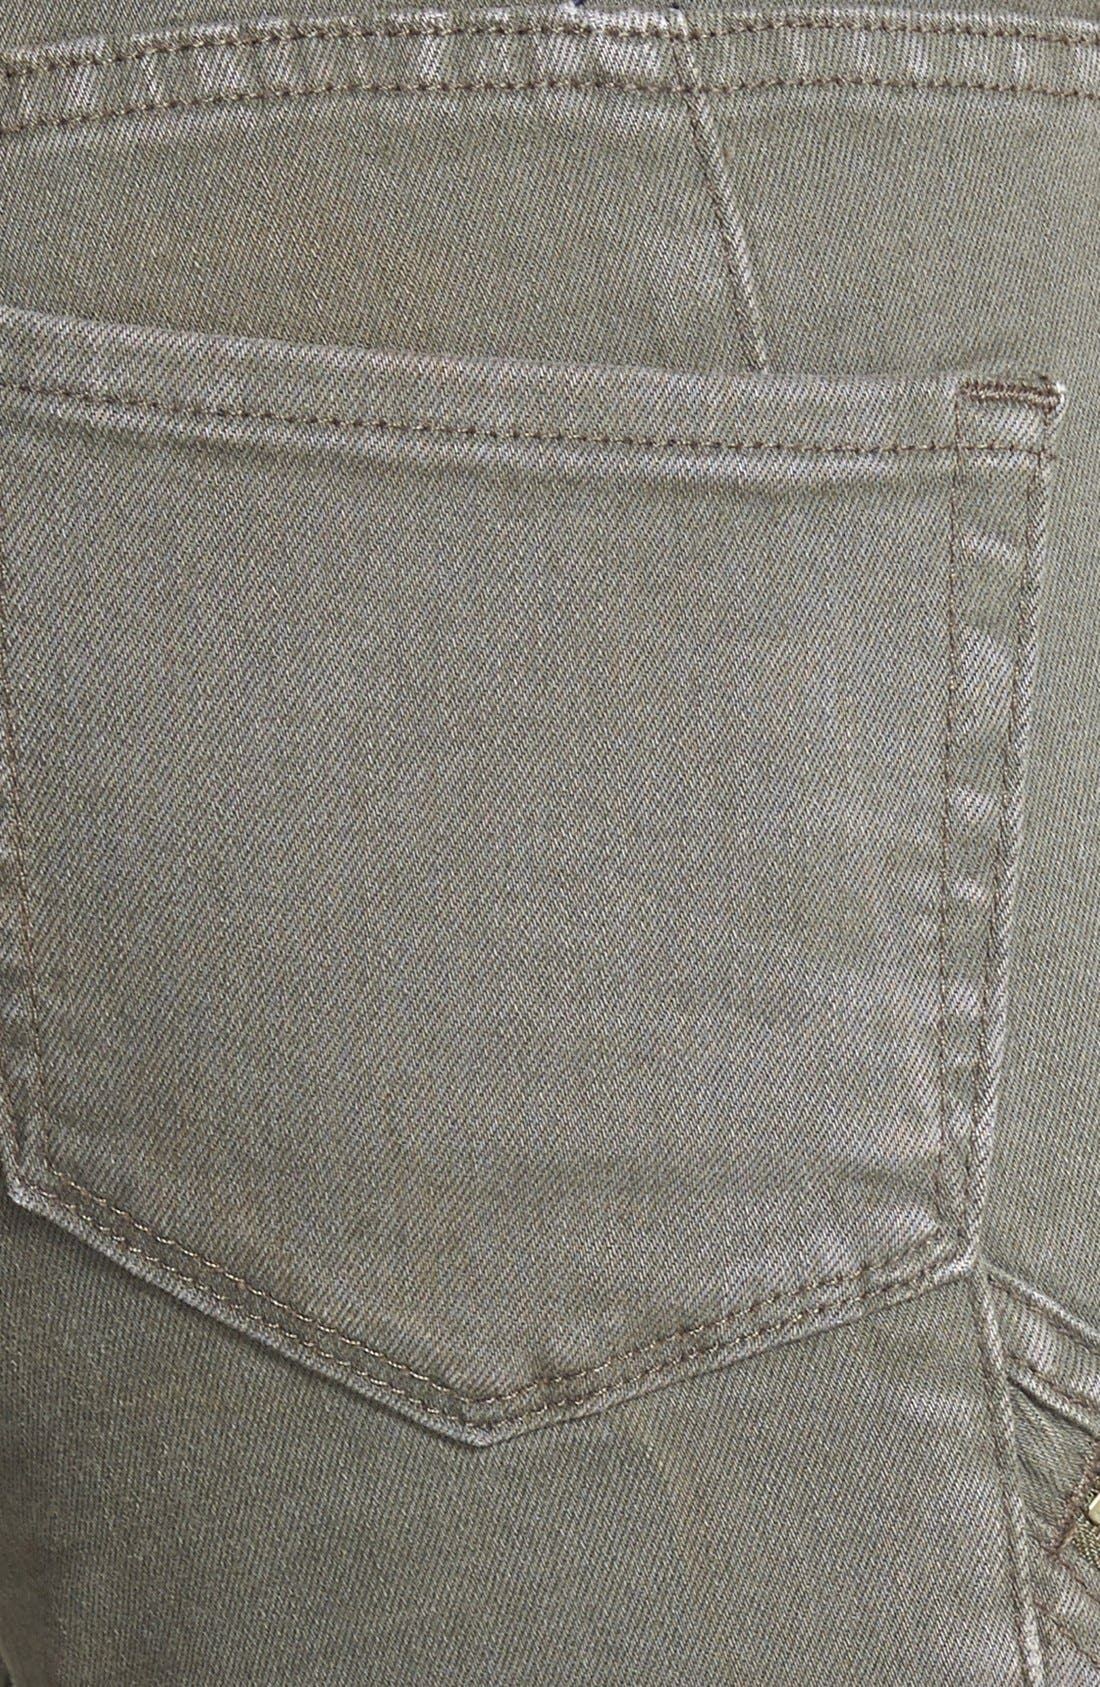 Alternate Image 3  - Treasure&Bond Zip Skinny Jeans (Olive Tarmac)